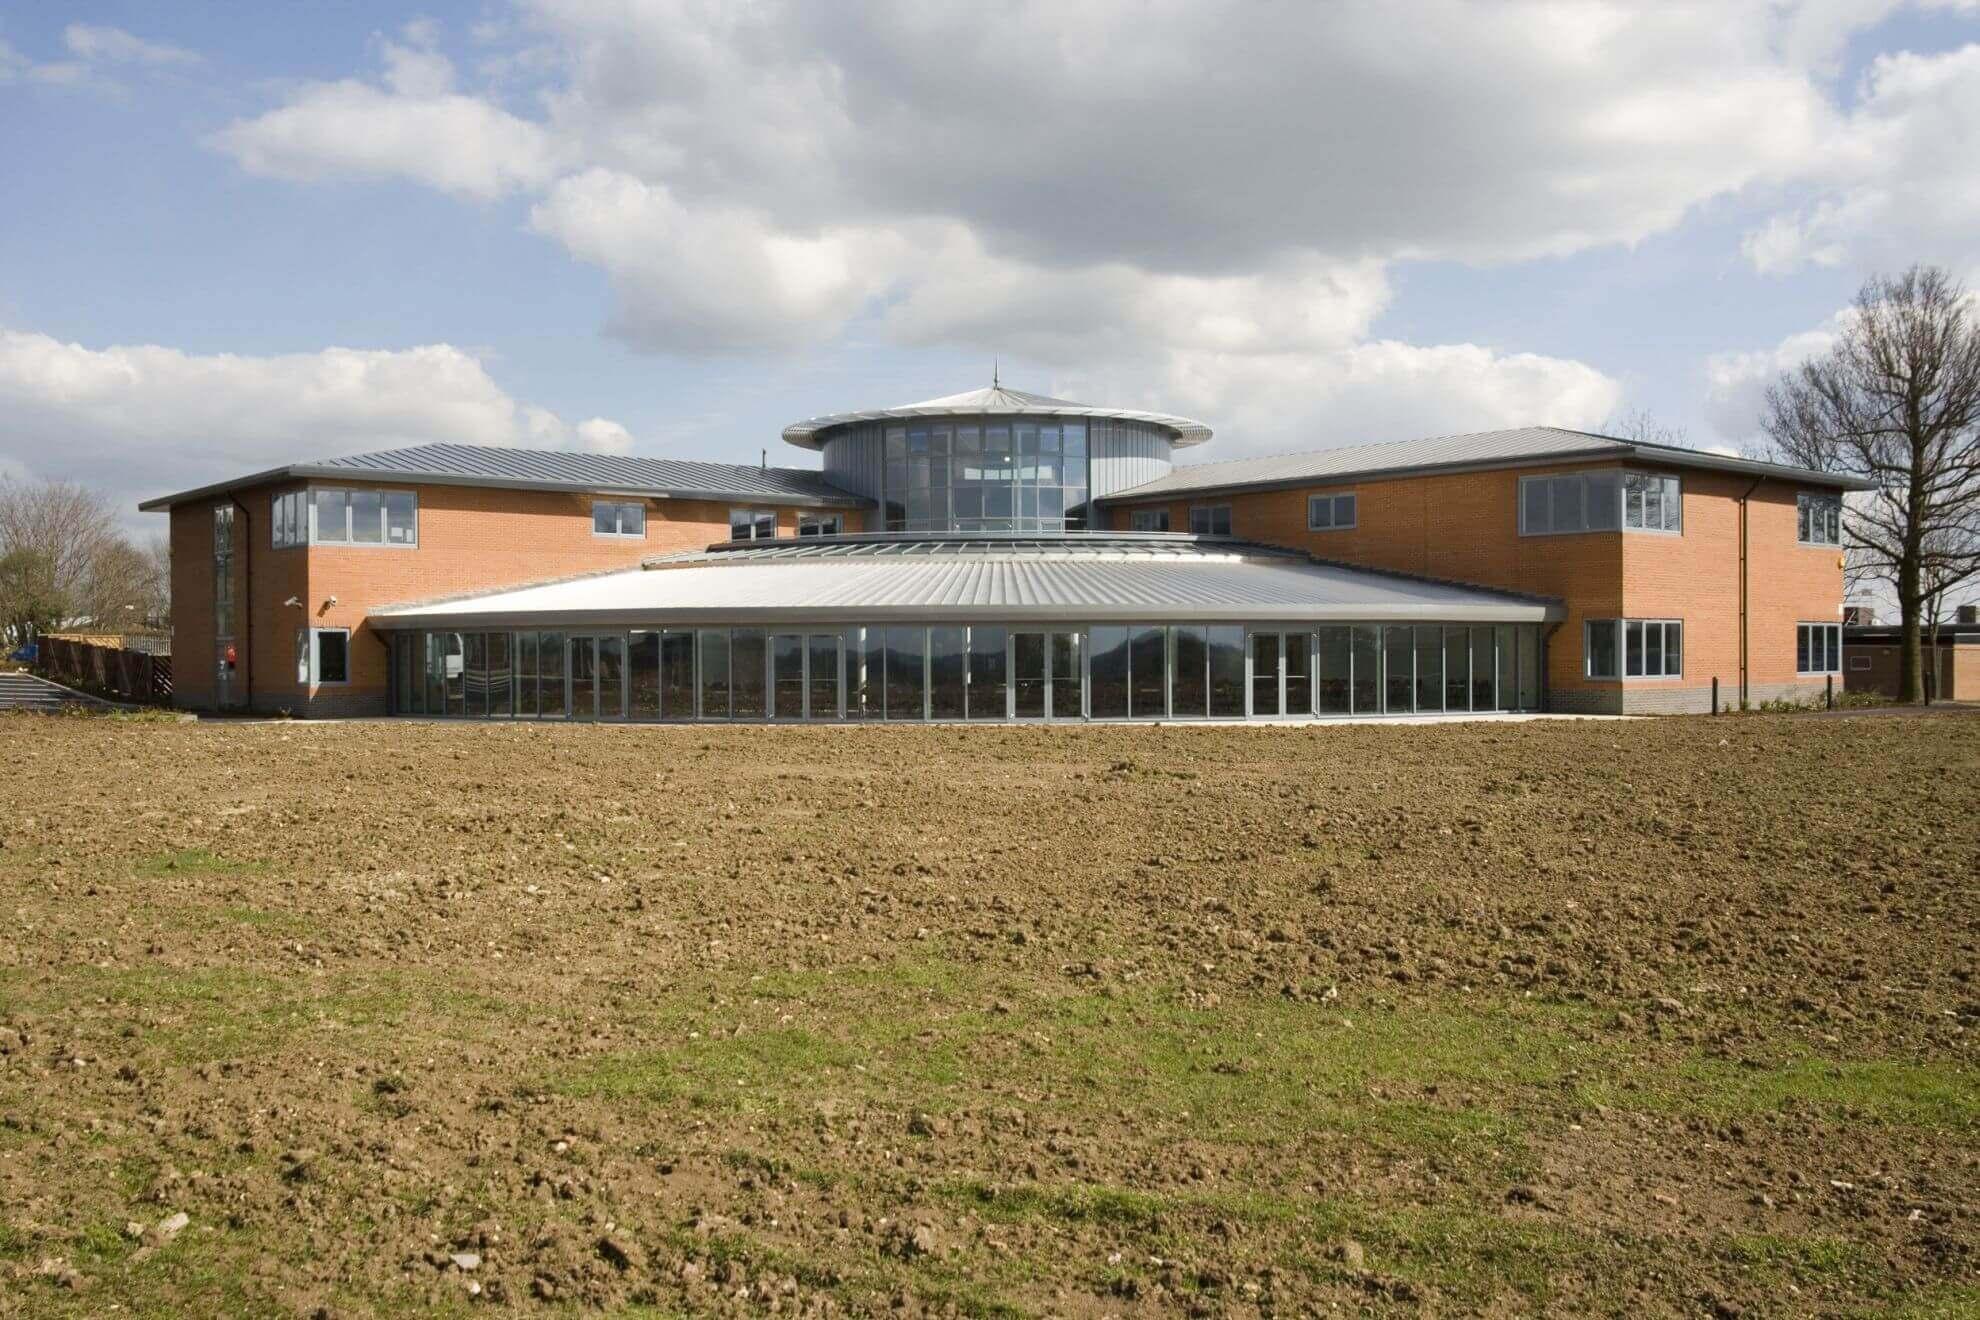 A_Bedford Modern School_Building Image